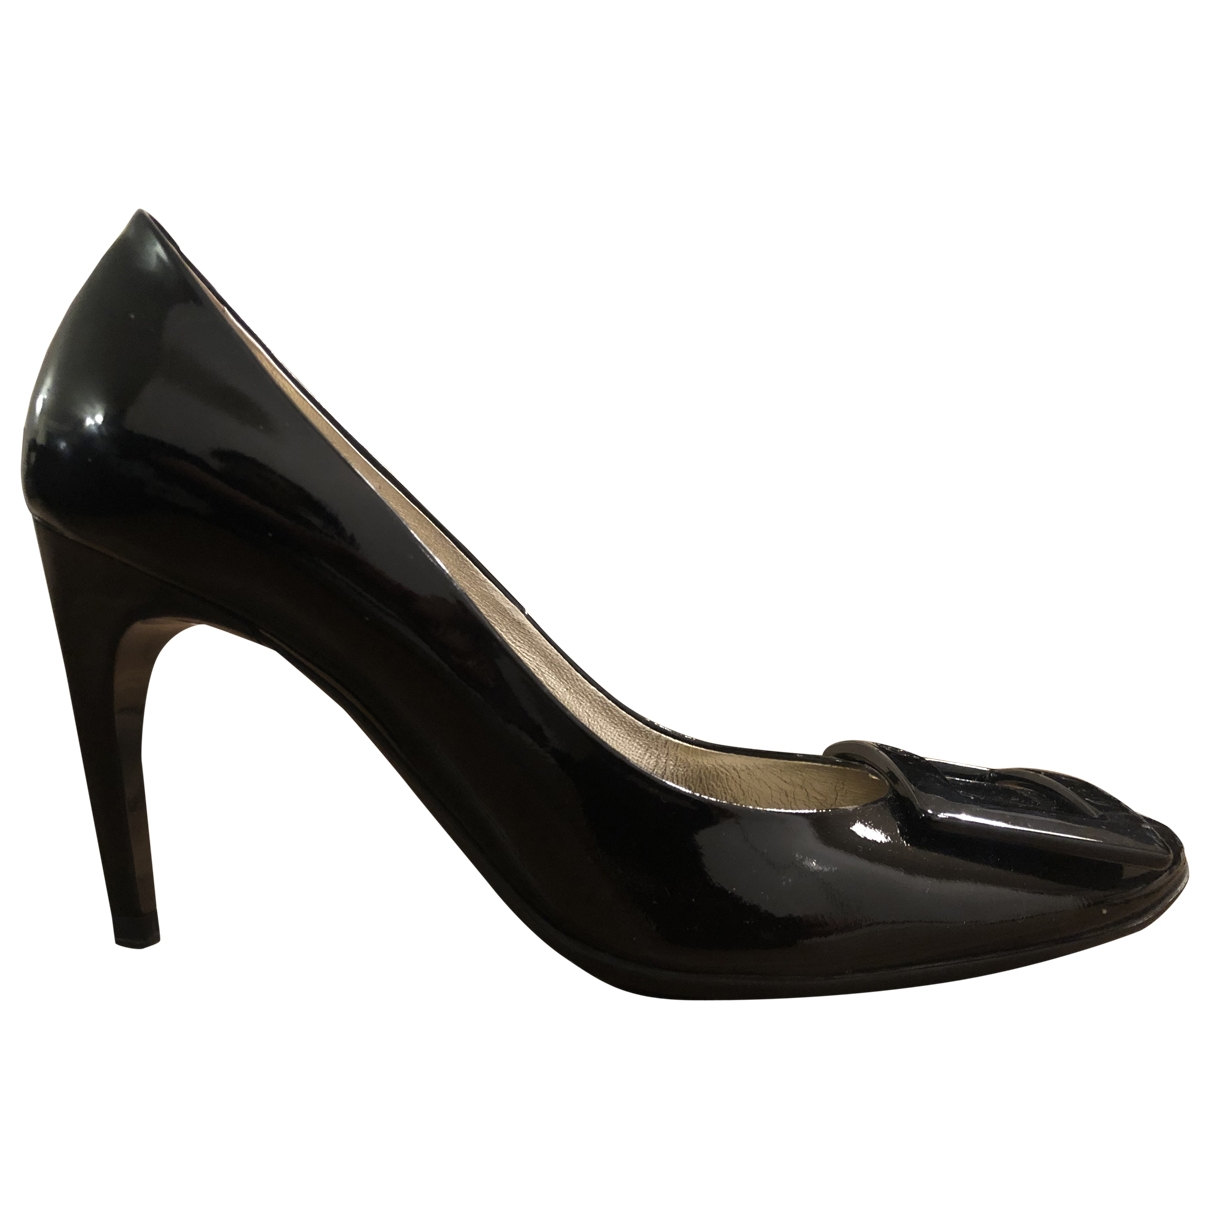 Roger Vivier Trompette Black Patent leather Heels for Women 38 EU